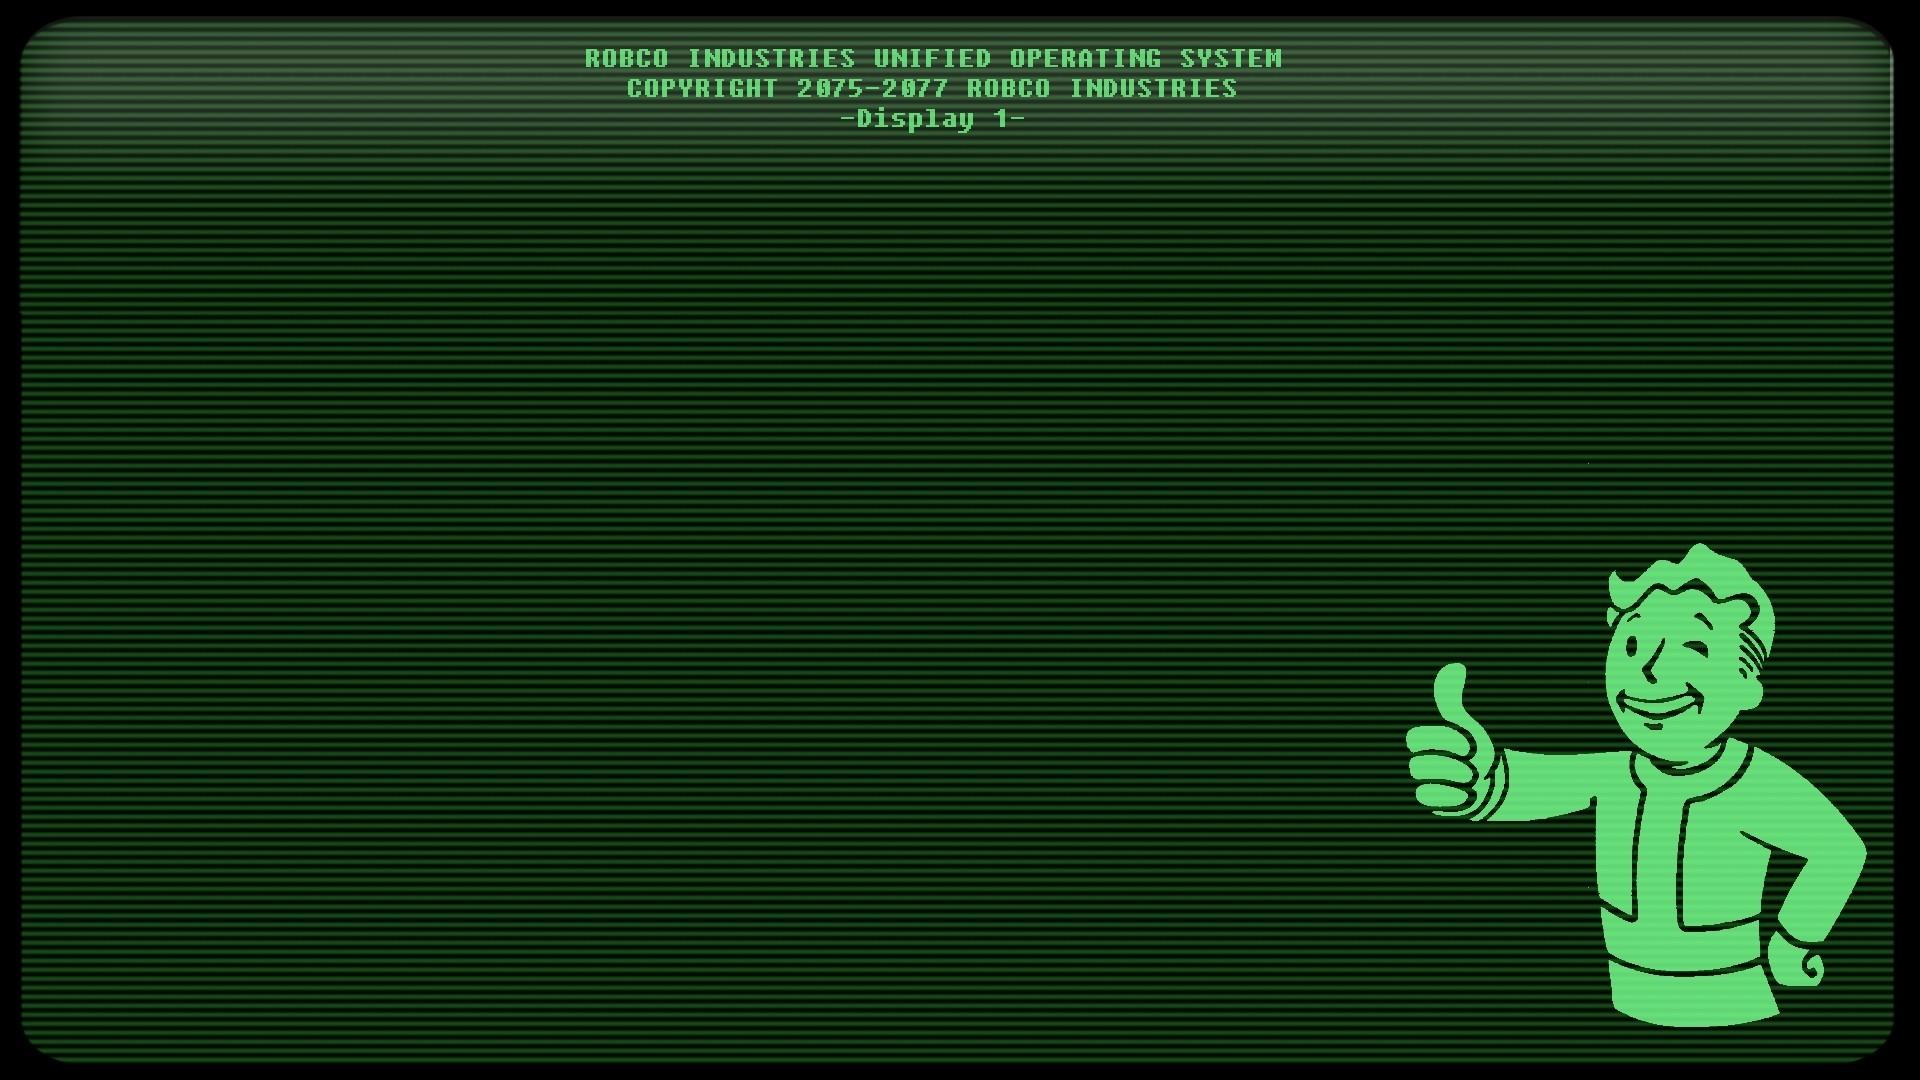 Wallpaper 1920x1080 Px Fallout 3 Lines Pip Boy Video Games